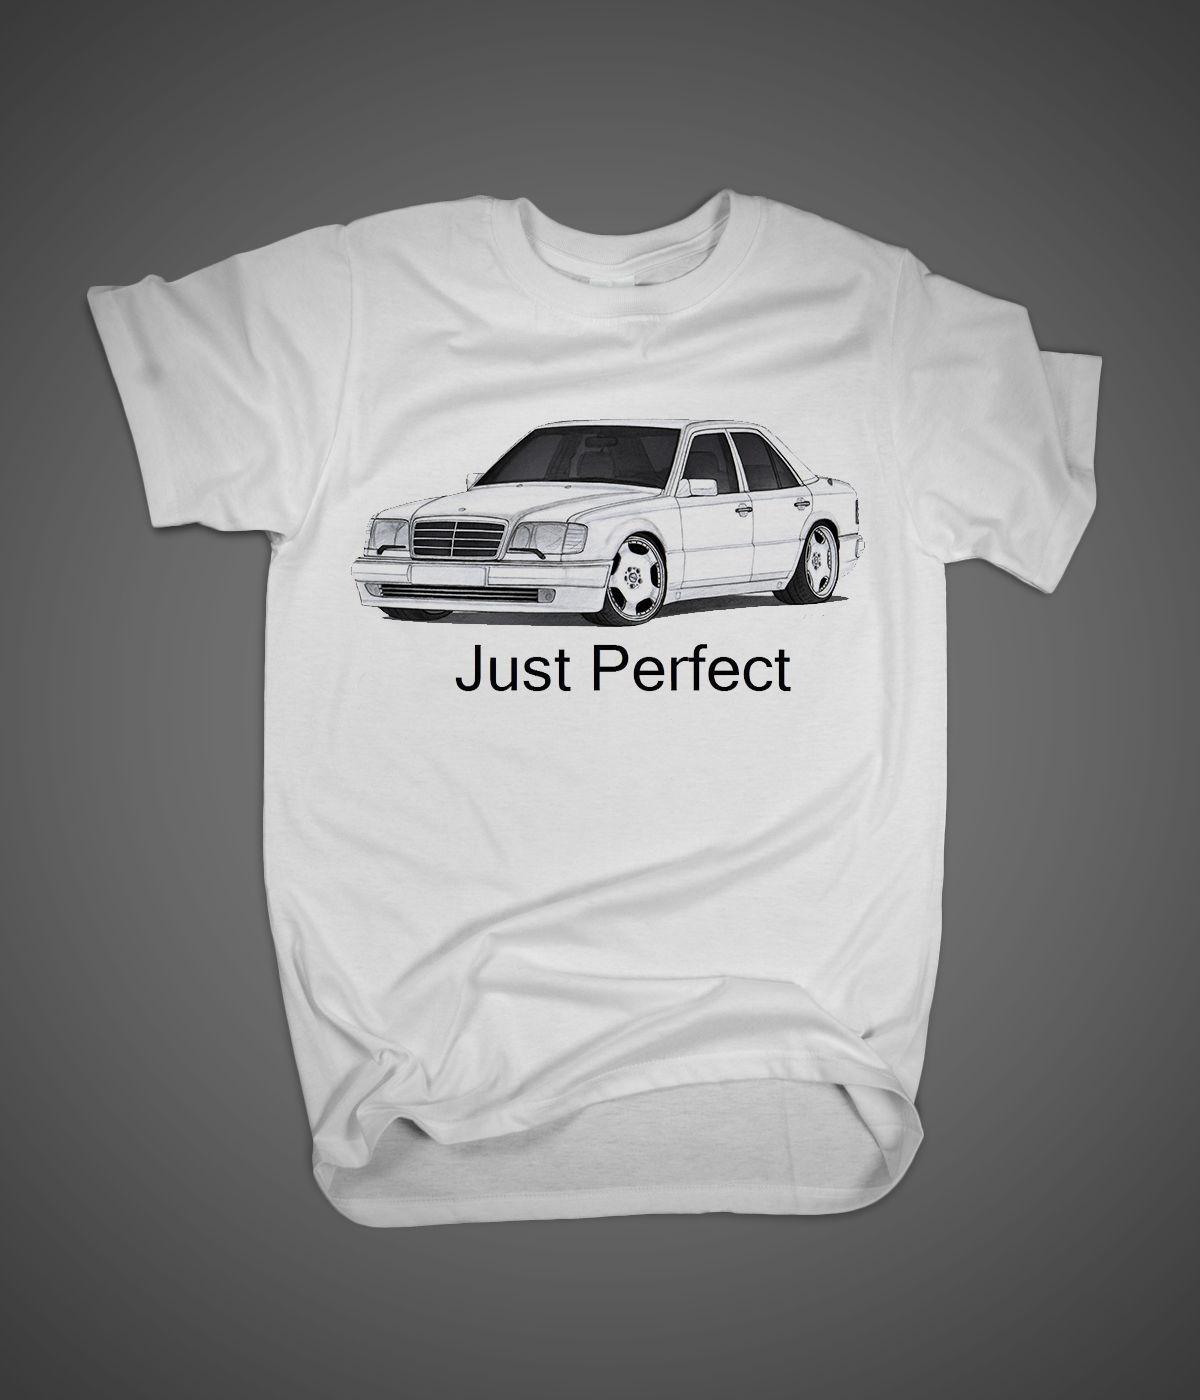 T Shirts Fashion 2019 Crew Neck Men Short-Sleeve New Germany Car 500E M119 Engine W124 381Bhp Evo-Ii Best Car Printing Shirt